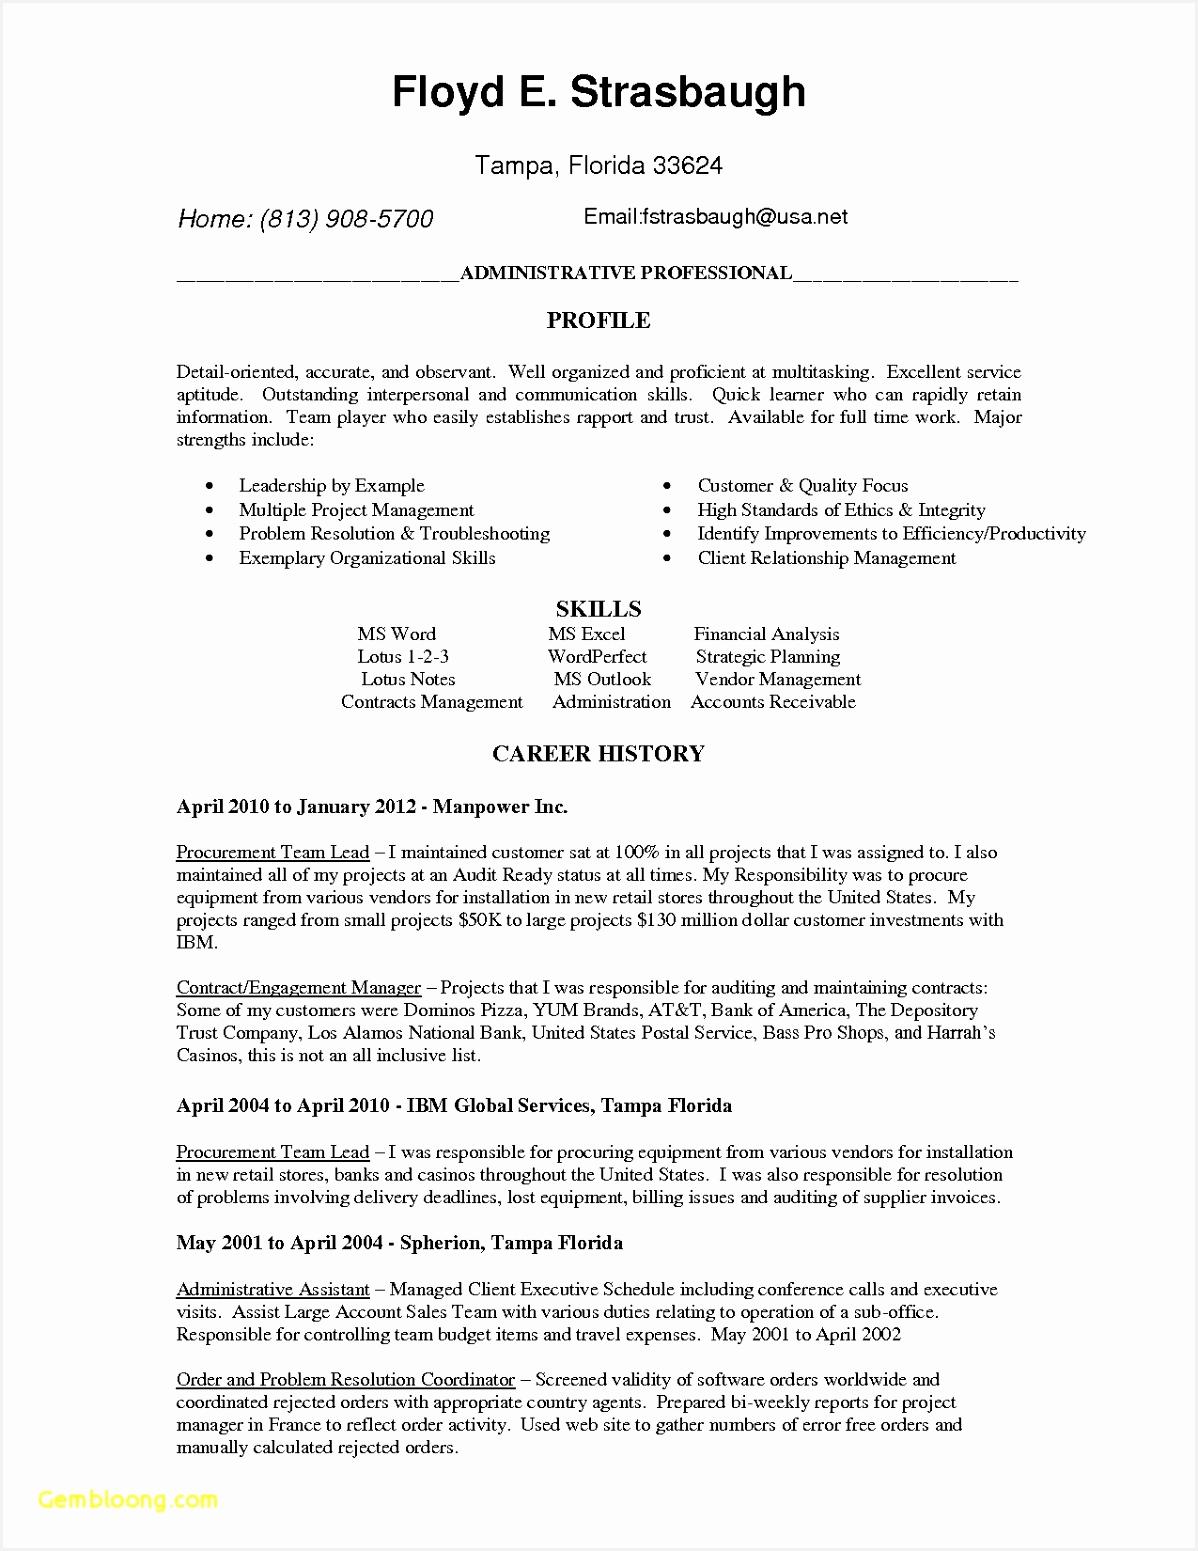 Cv Templates Download R0qsz Beautiful Word Resume Templates – Professional Resume Template Of 5 Cv Templates Download